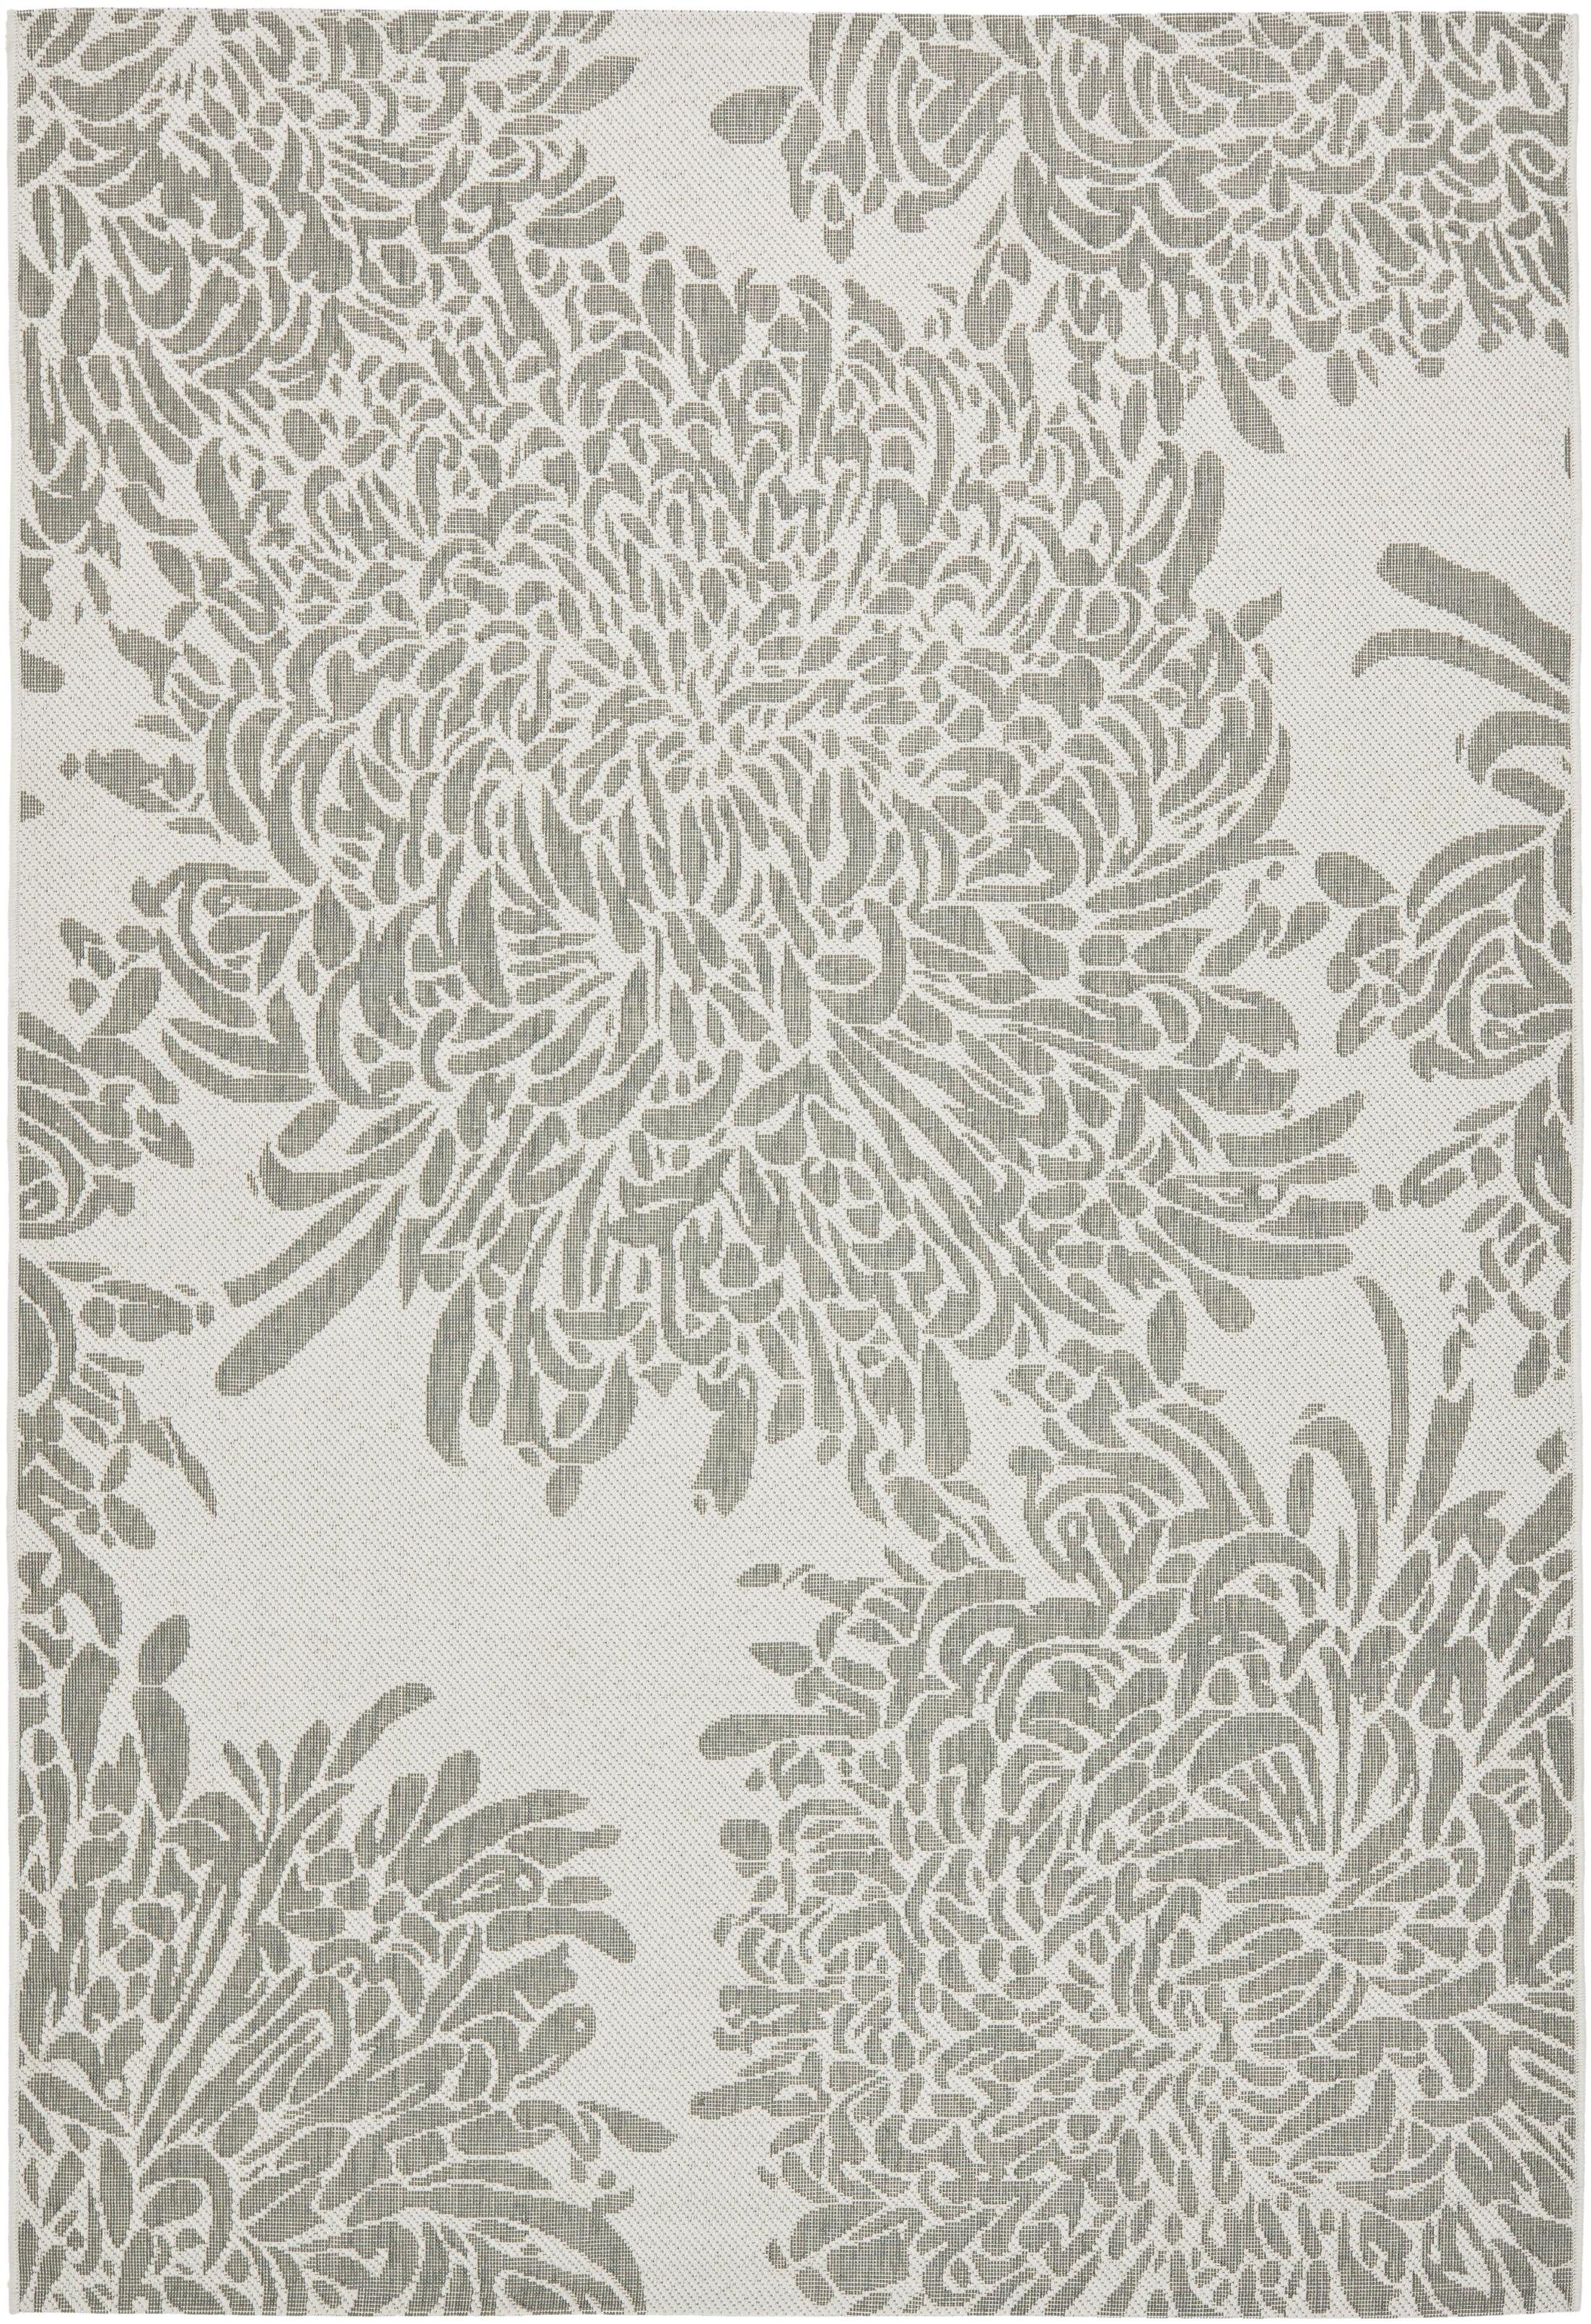 Chrysanthemum Gray Area Rug Rug Size: Rectangle 4' x 5'7